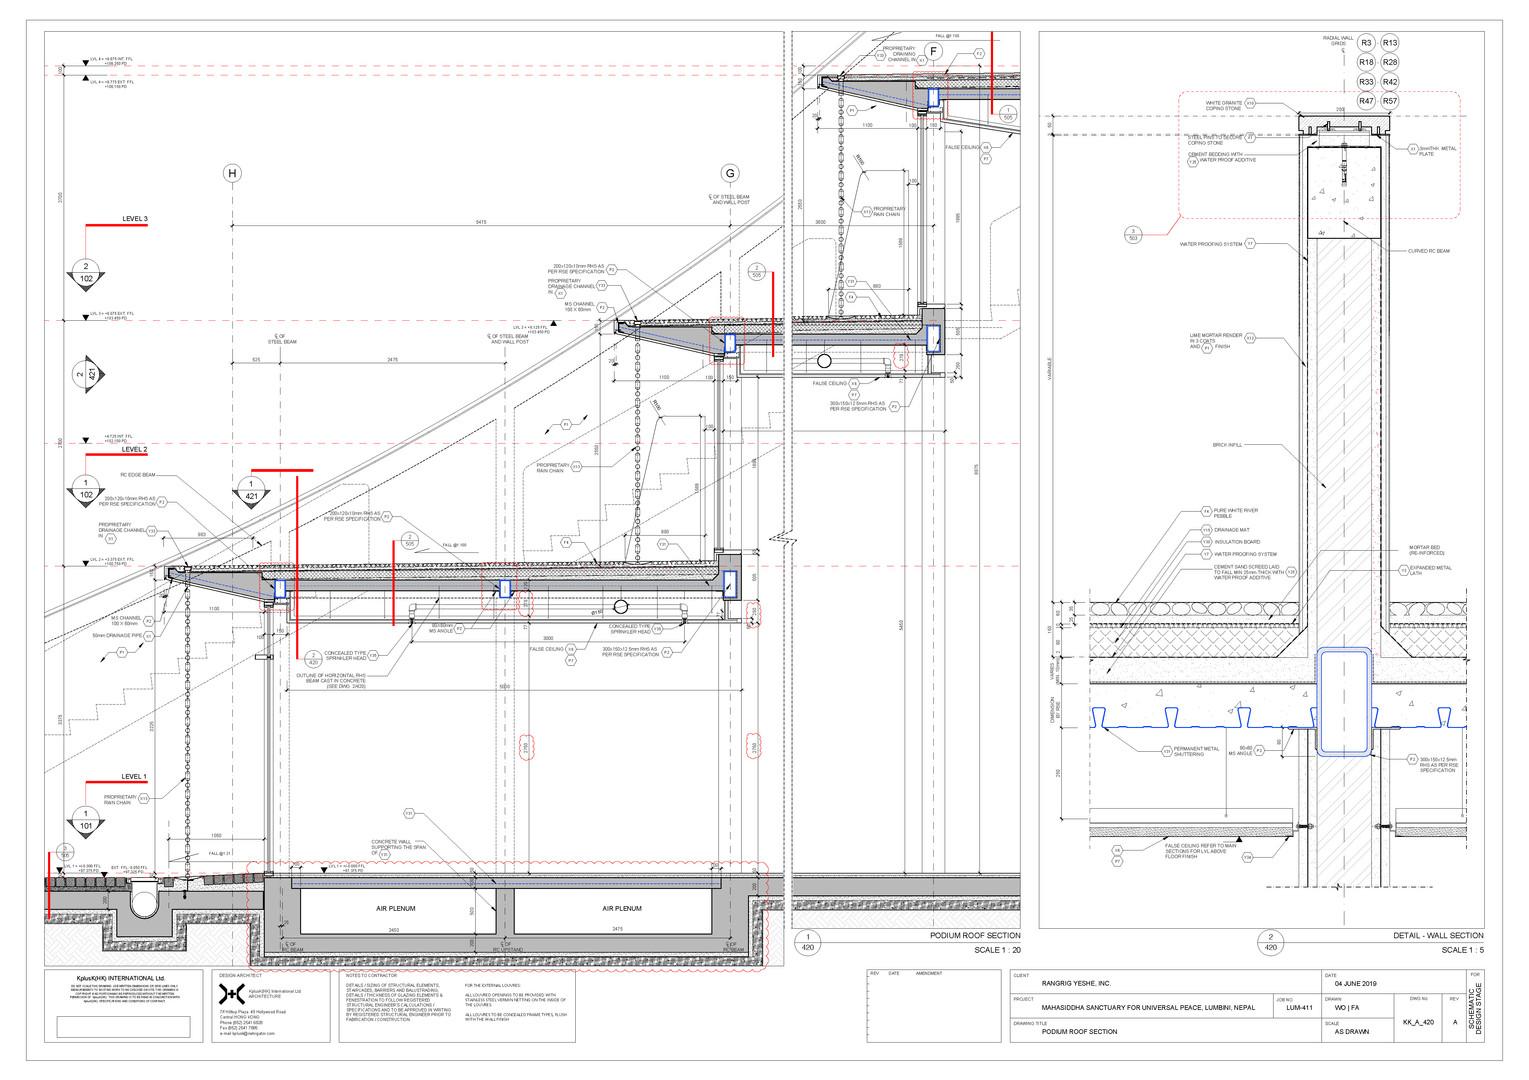 KK_A_420-Rev_A Podium Roof Section.jpg